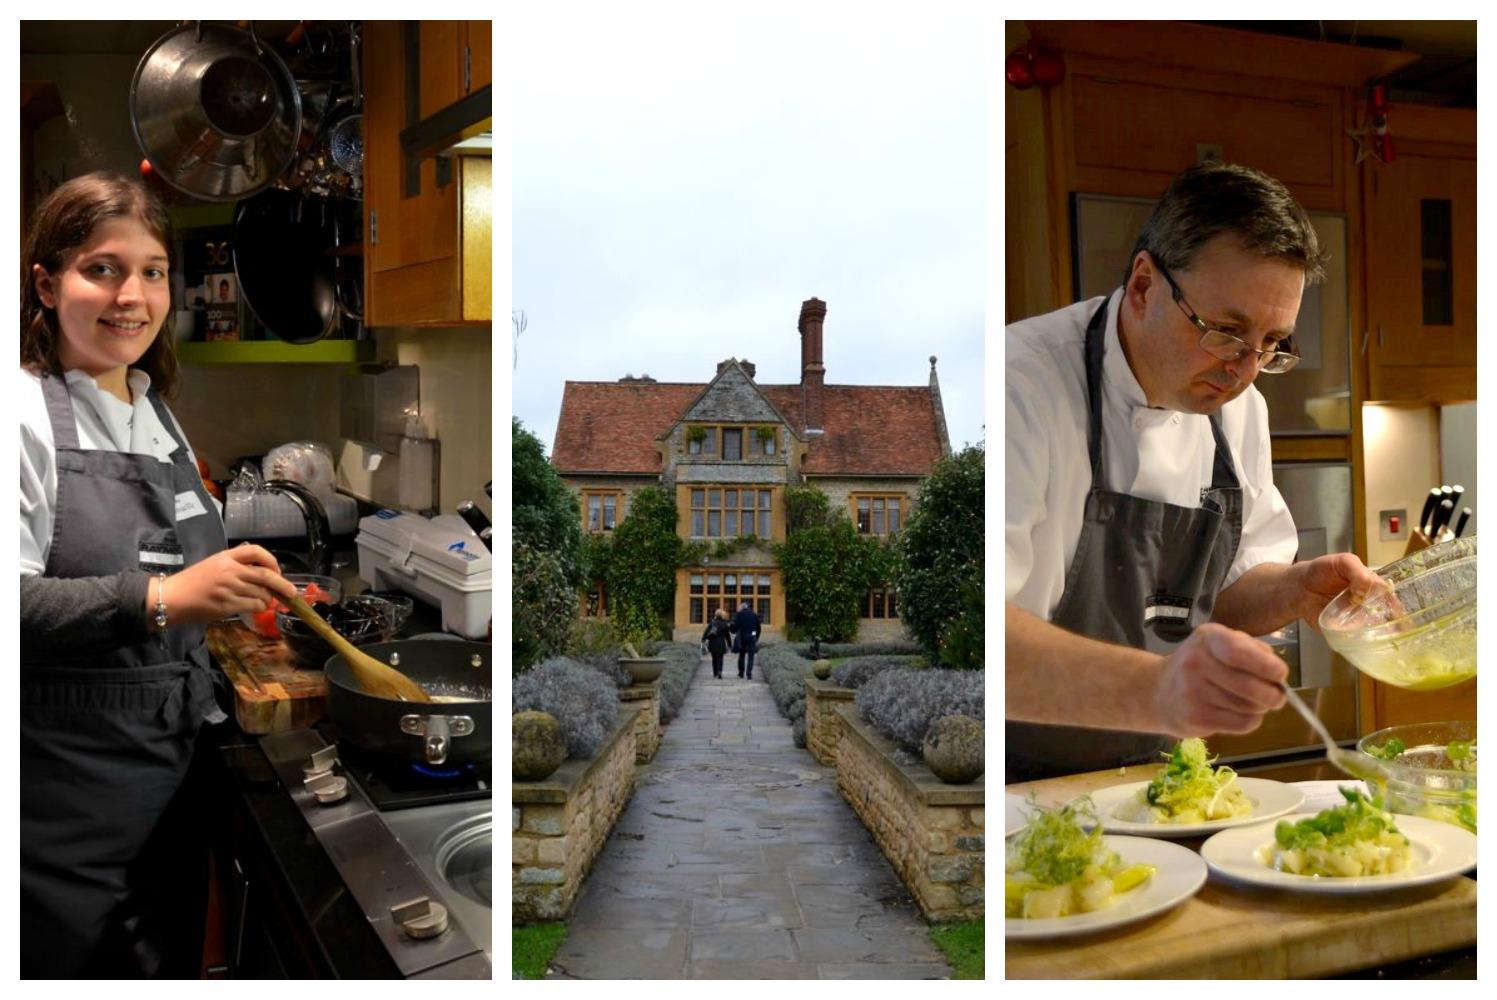 Raymond blanc cookery school cours de cuisine au manoir - Cours de cuisine luxembourg ...